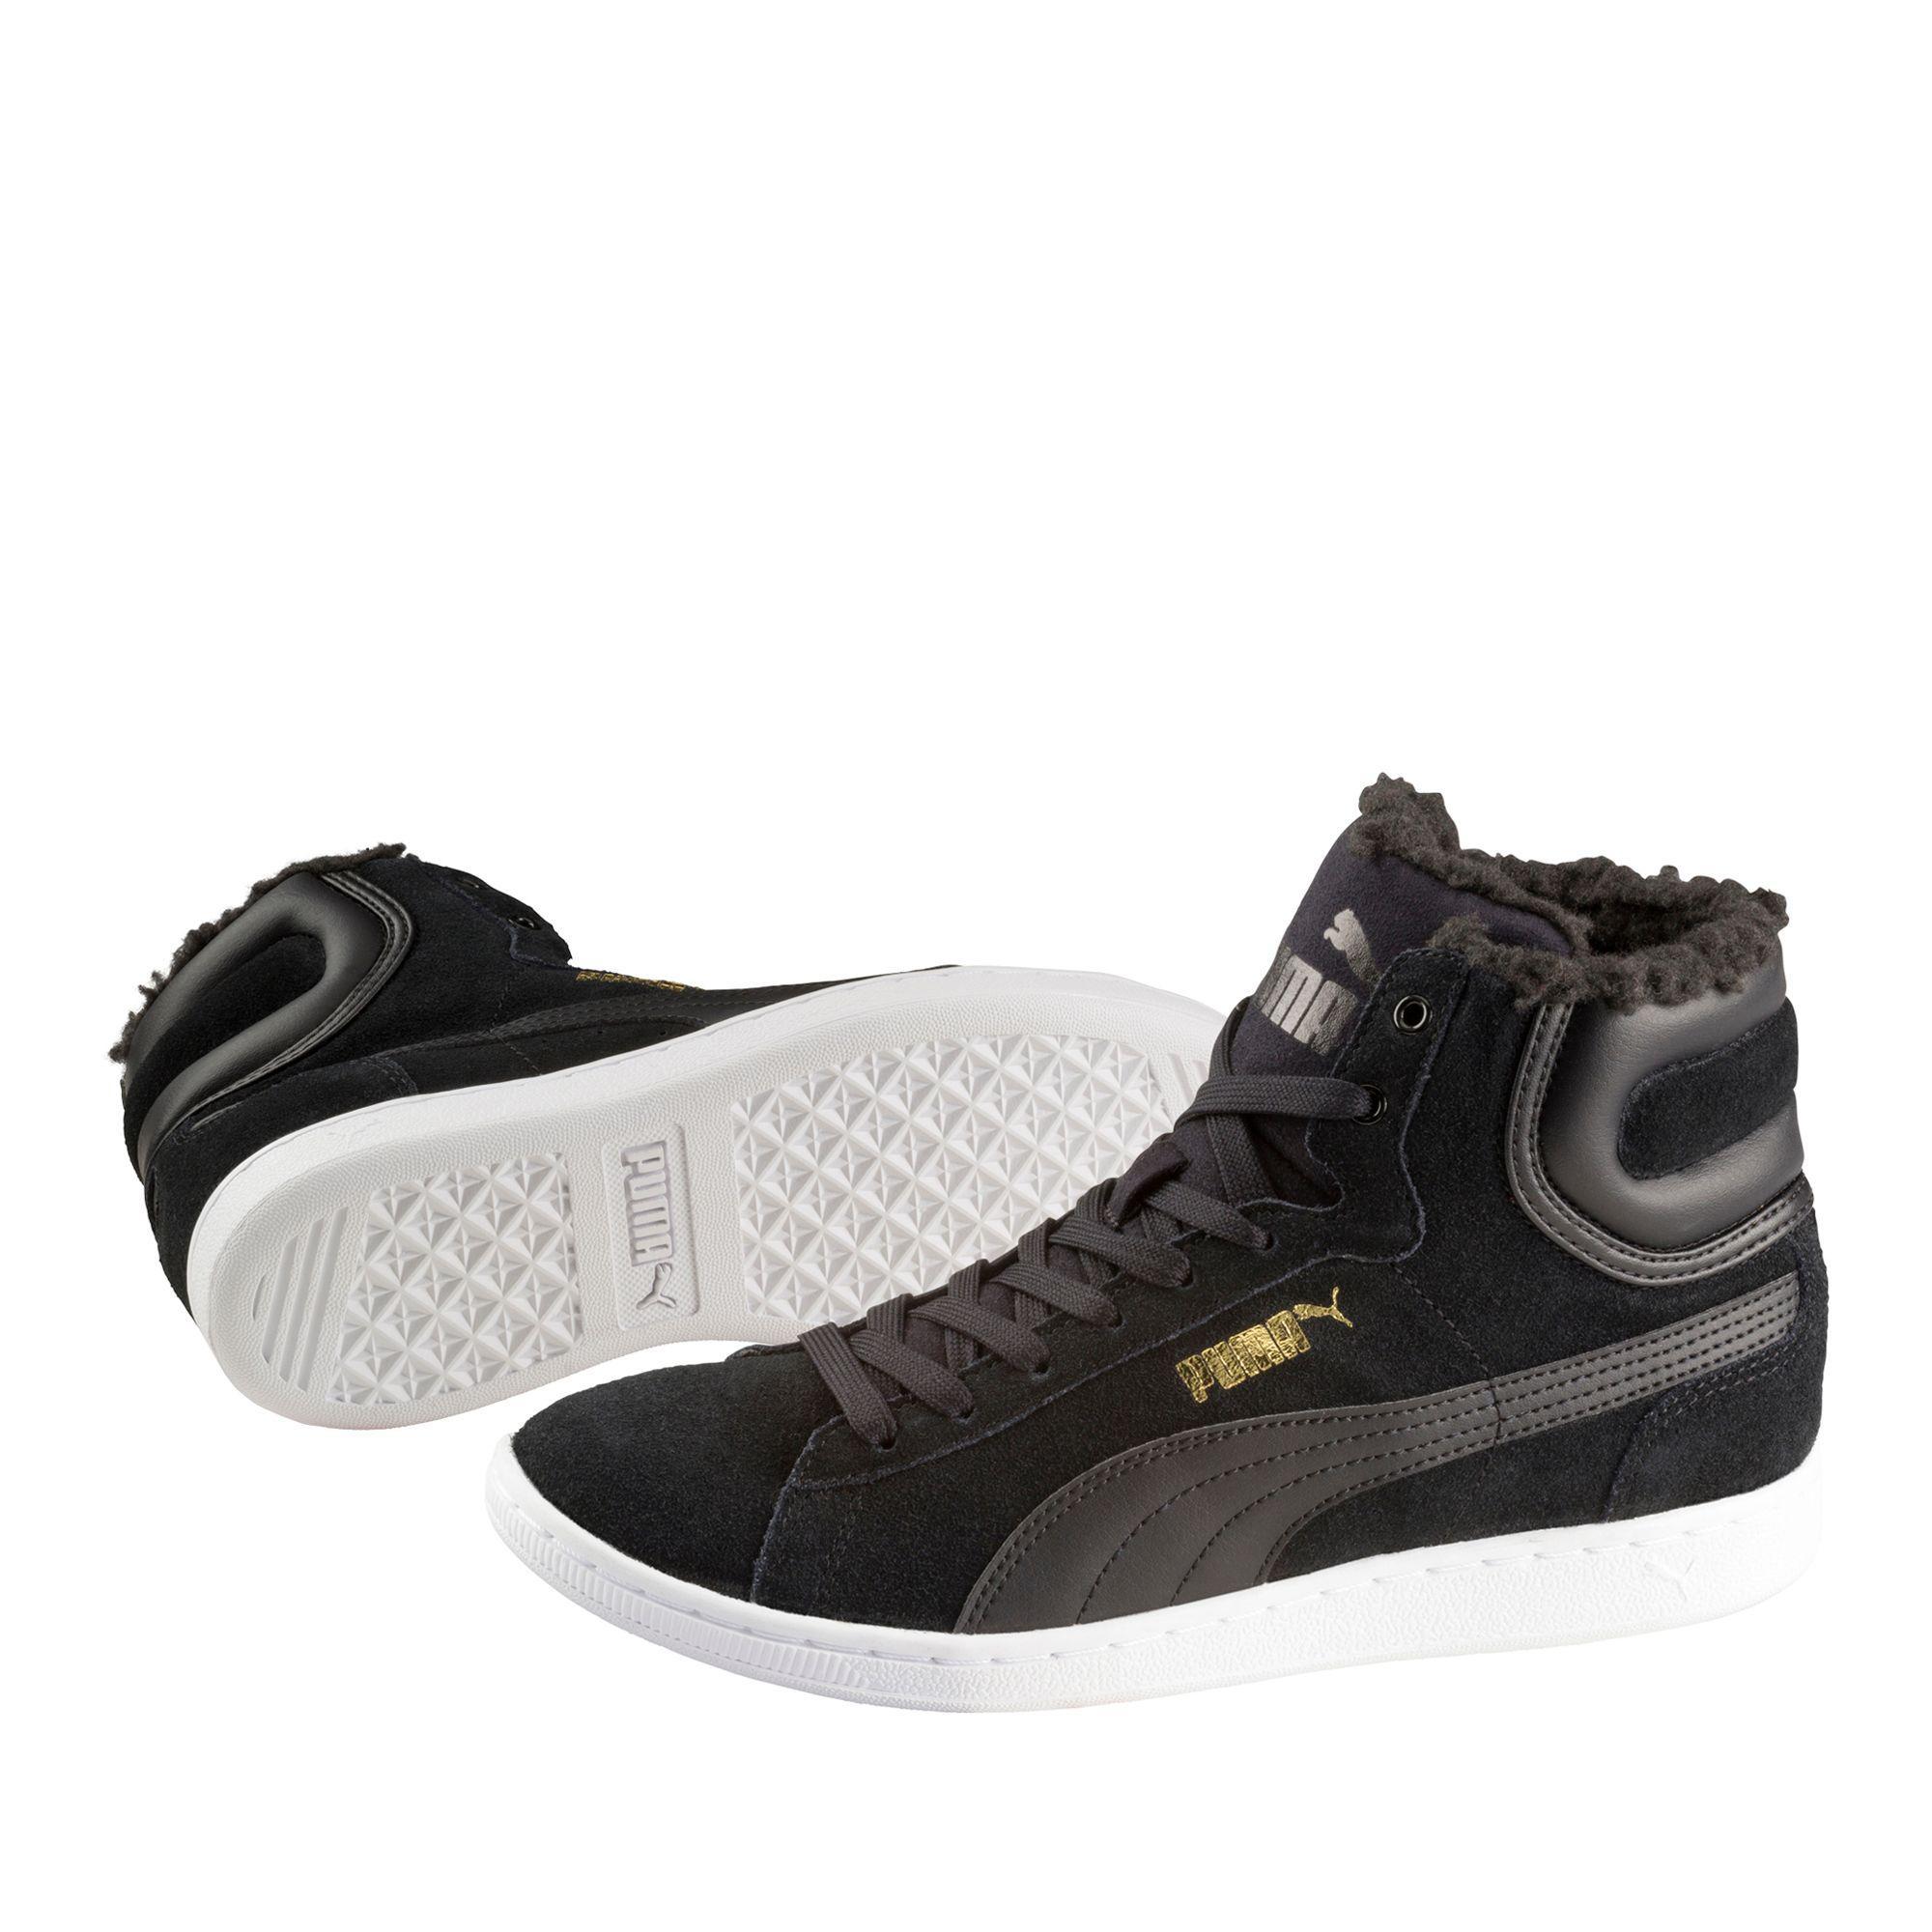 Chaussures montantes Femme Puma Vikky Winter